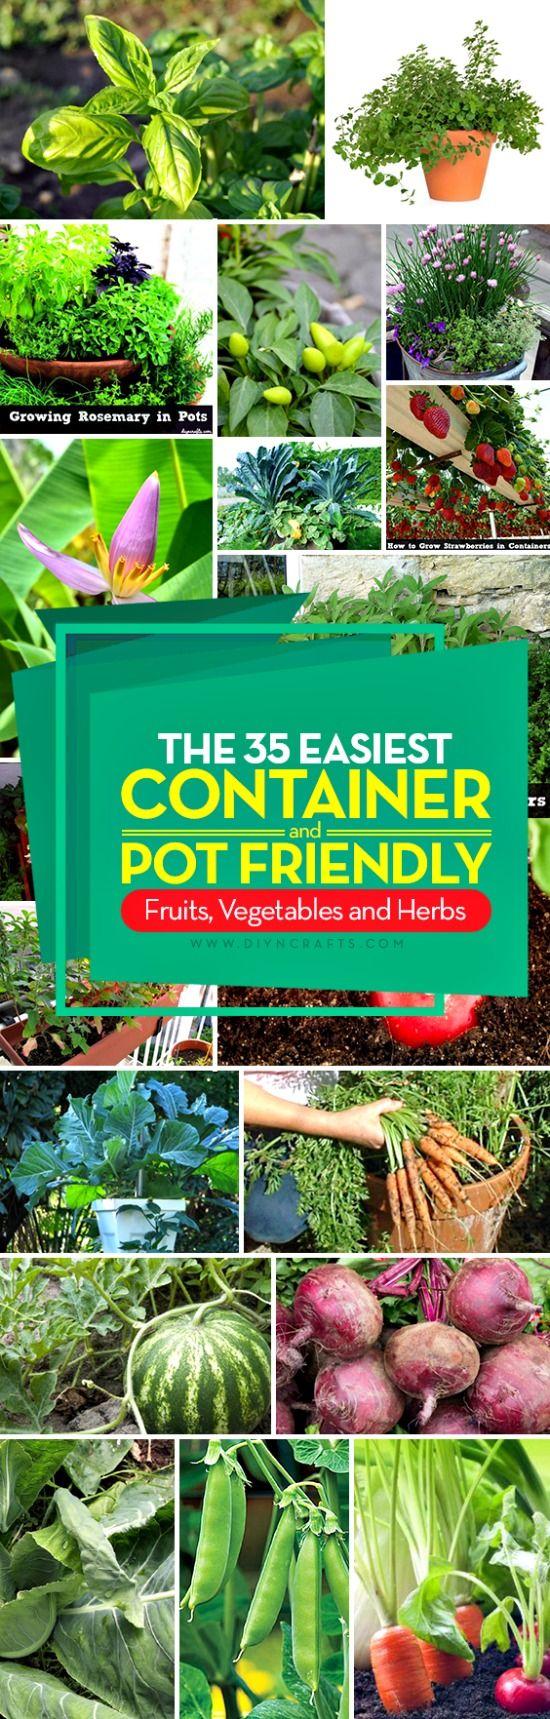 best gardening food images on pinterest container garden